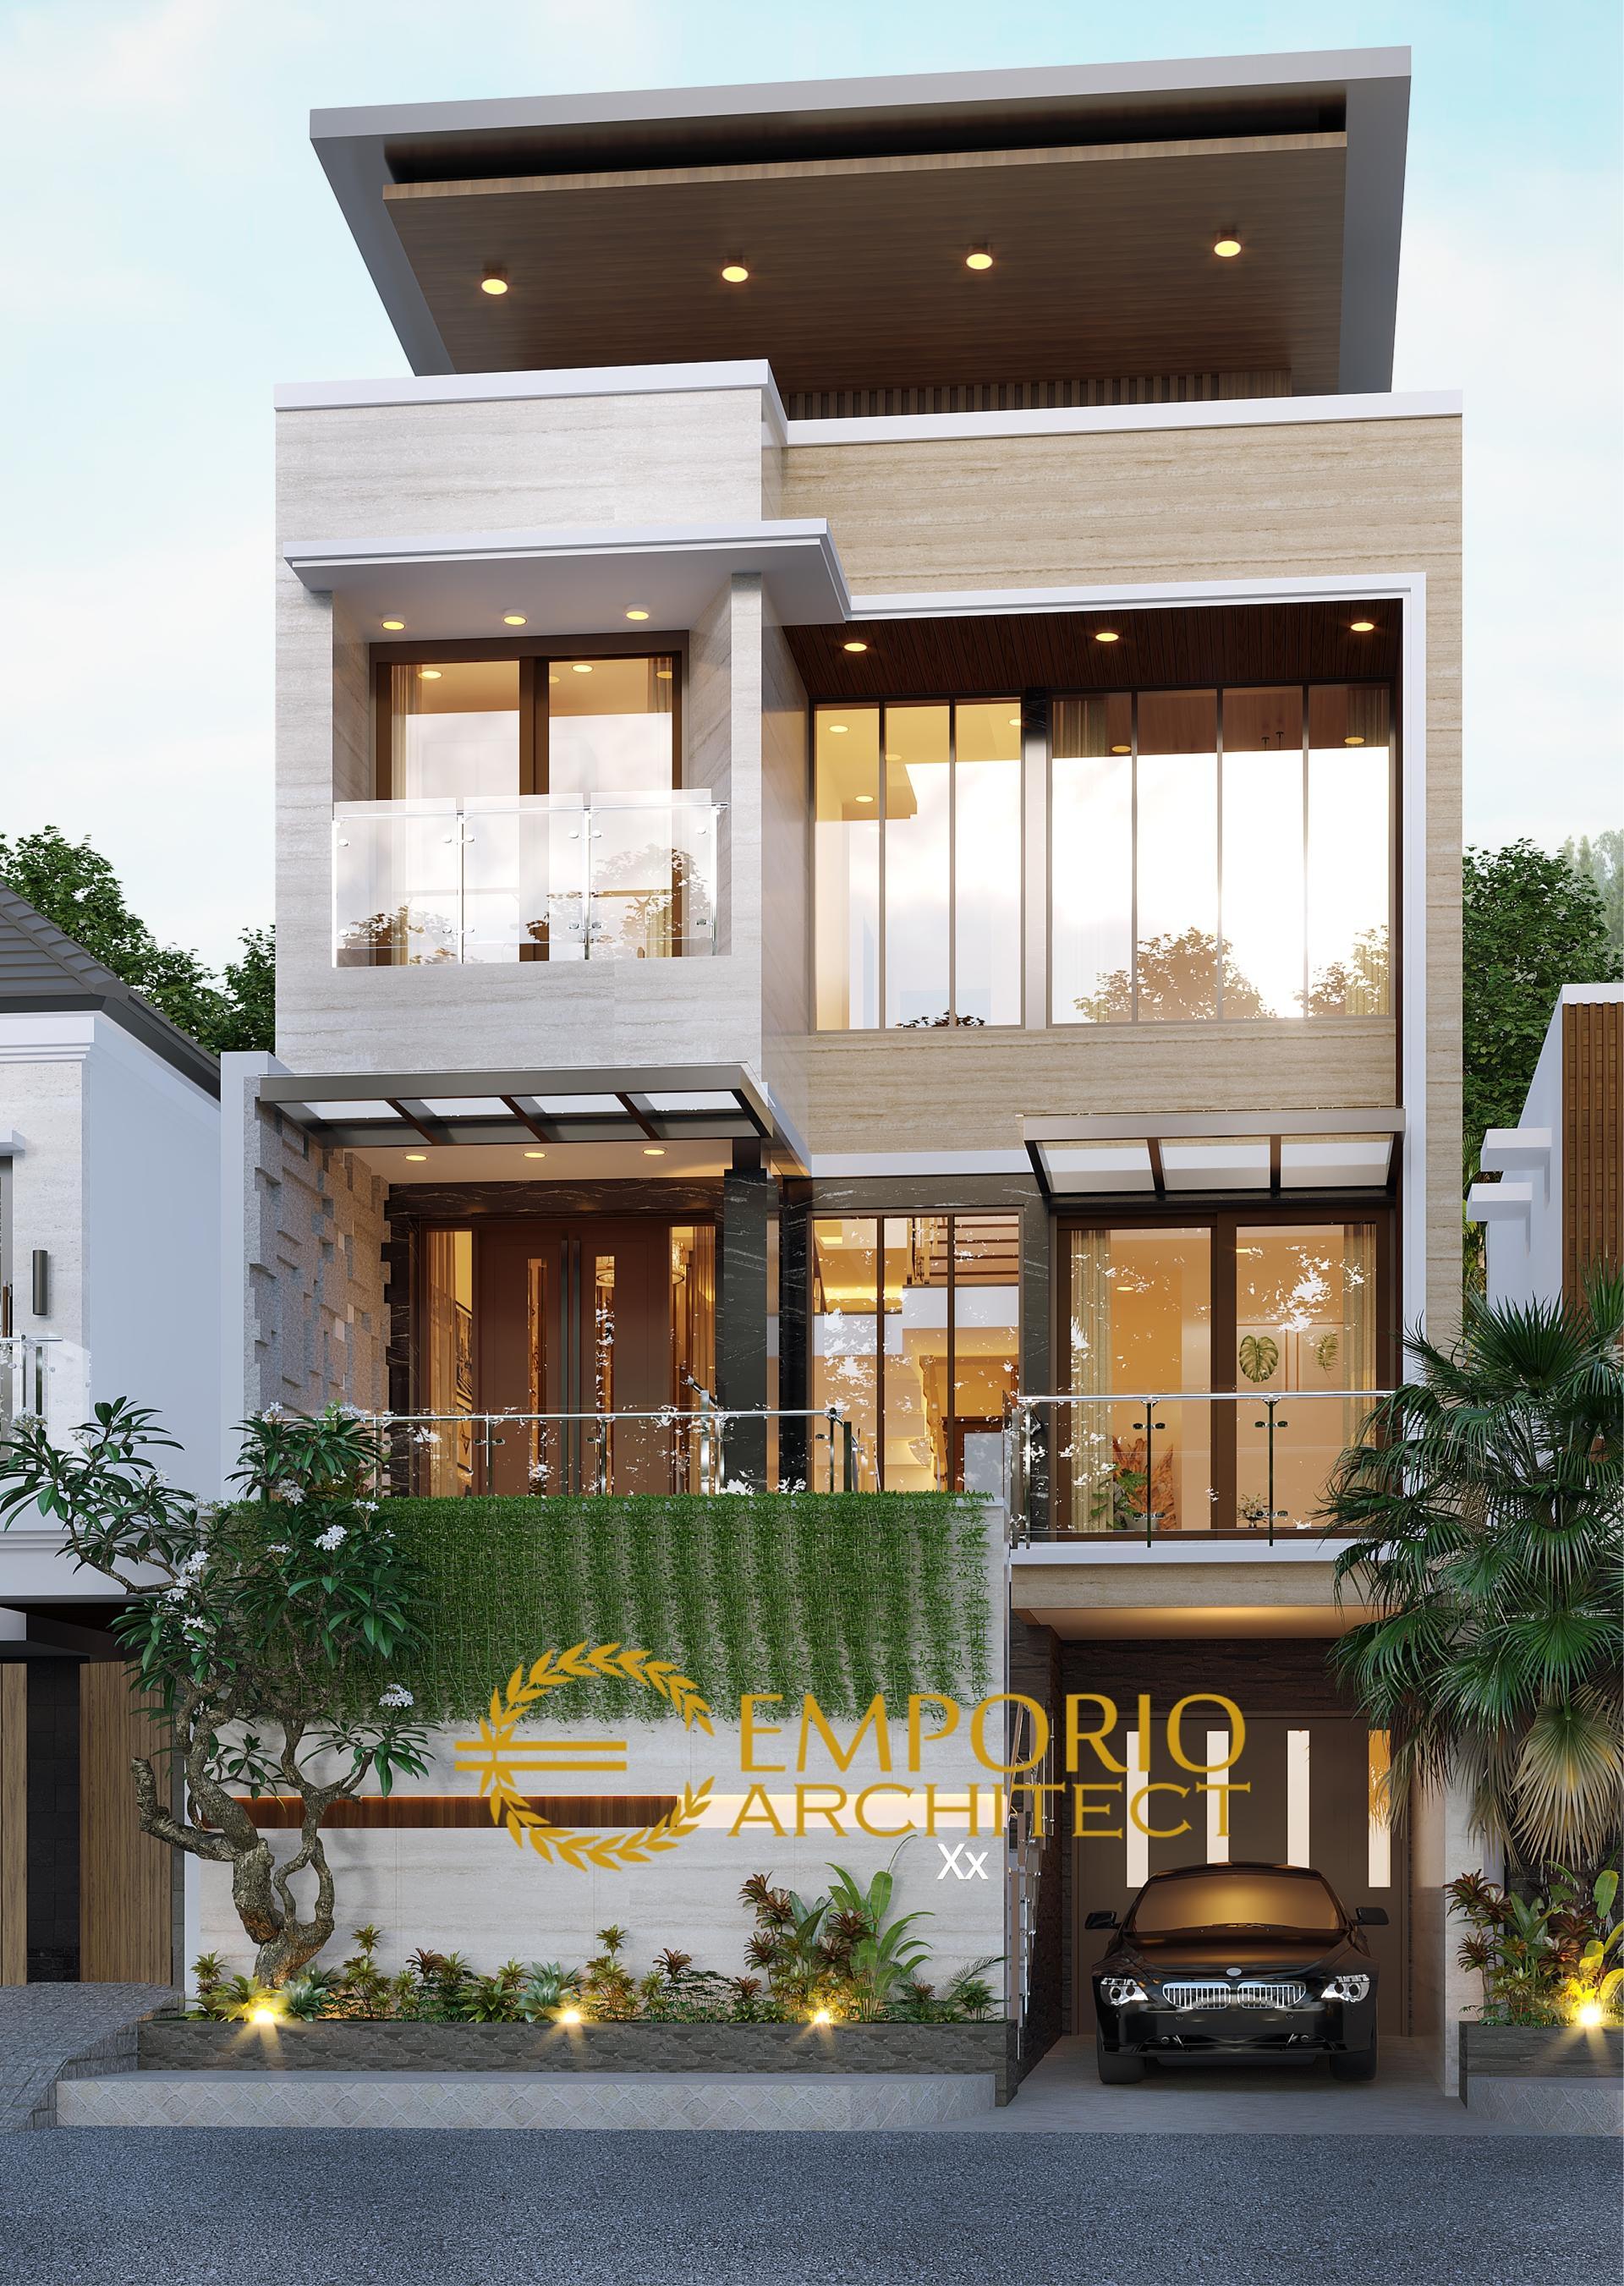 Desain Rumah Modern 3 Lantai Bapak Angga Di Surabaya Jawa Timur